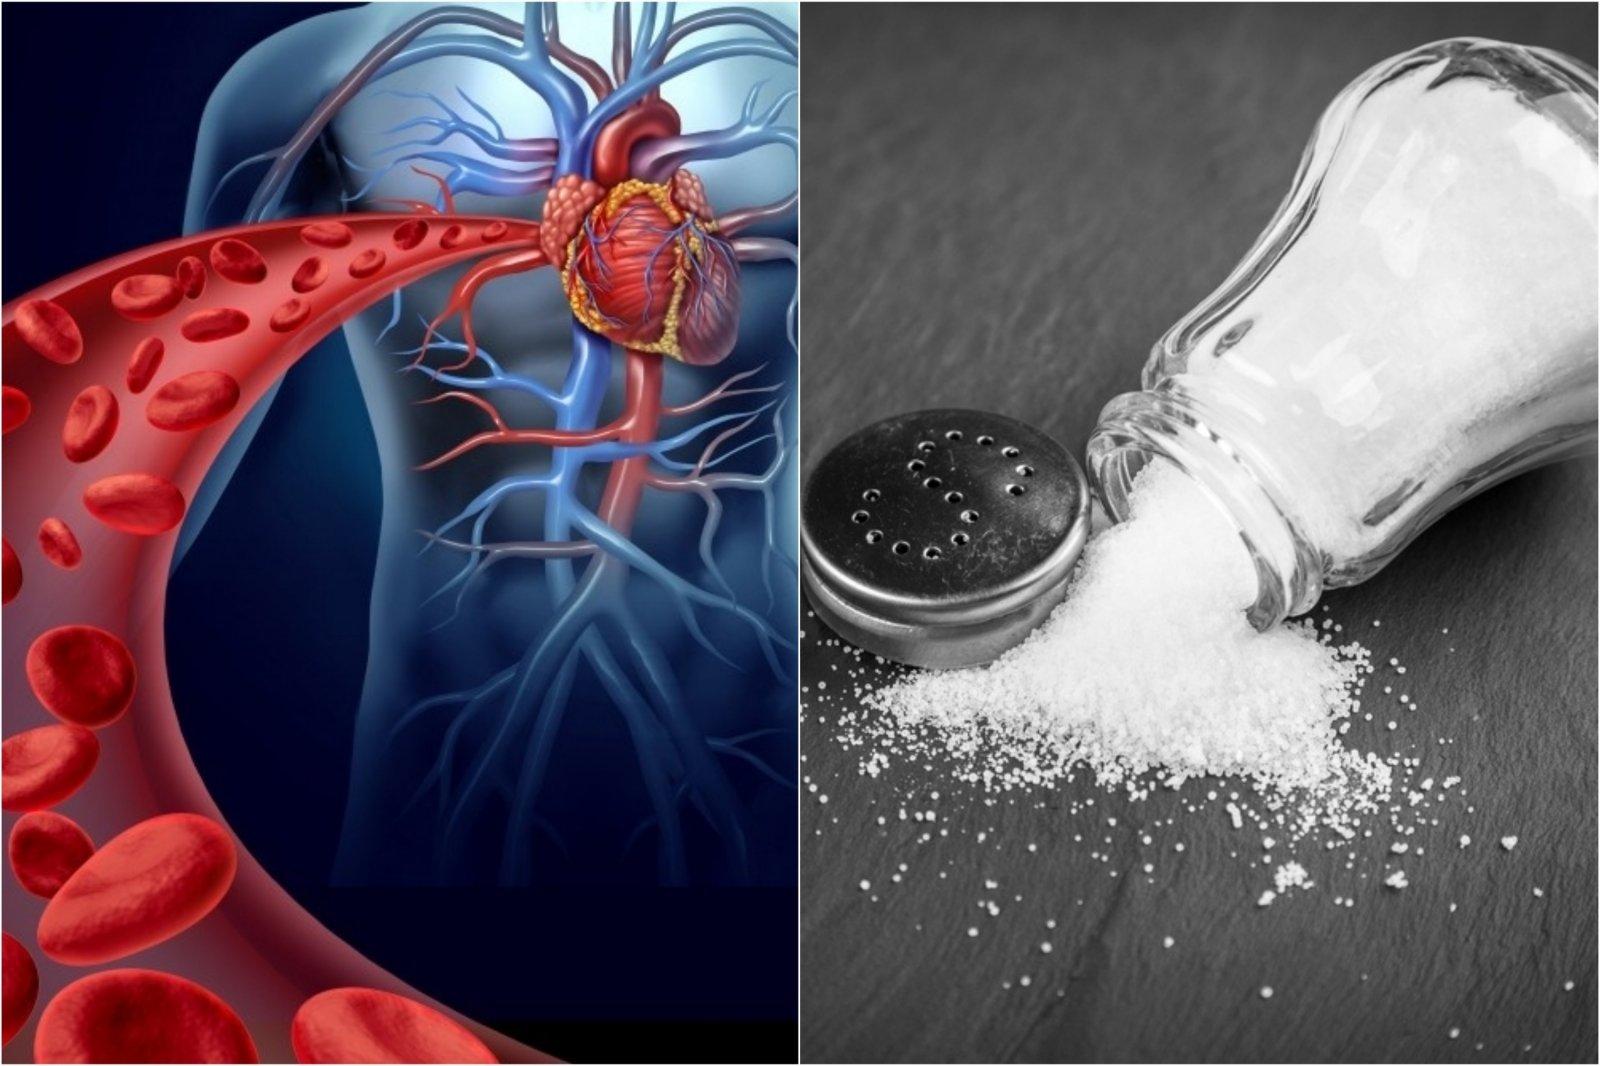 druskos norma per dieną sergant hipertenzija